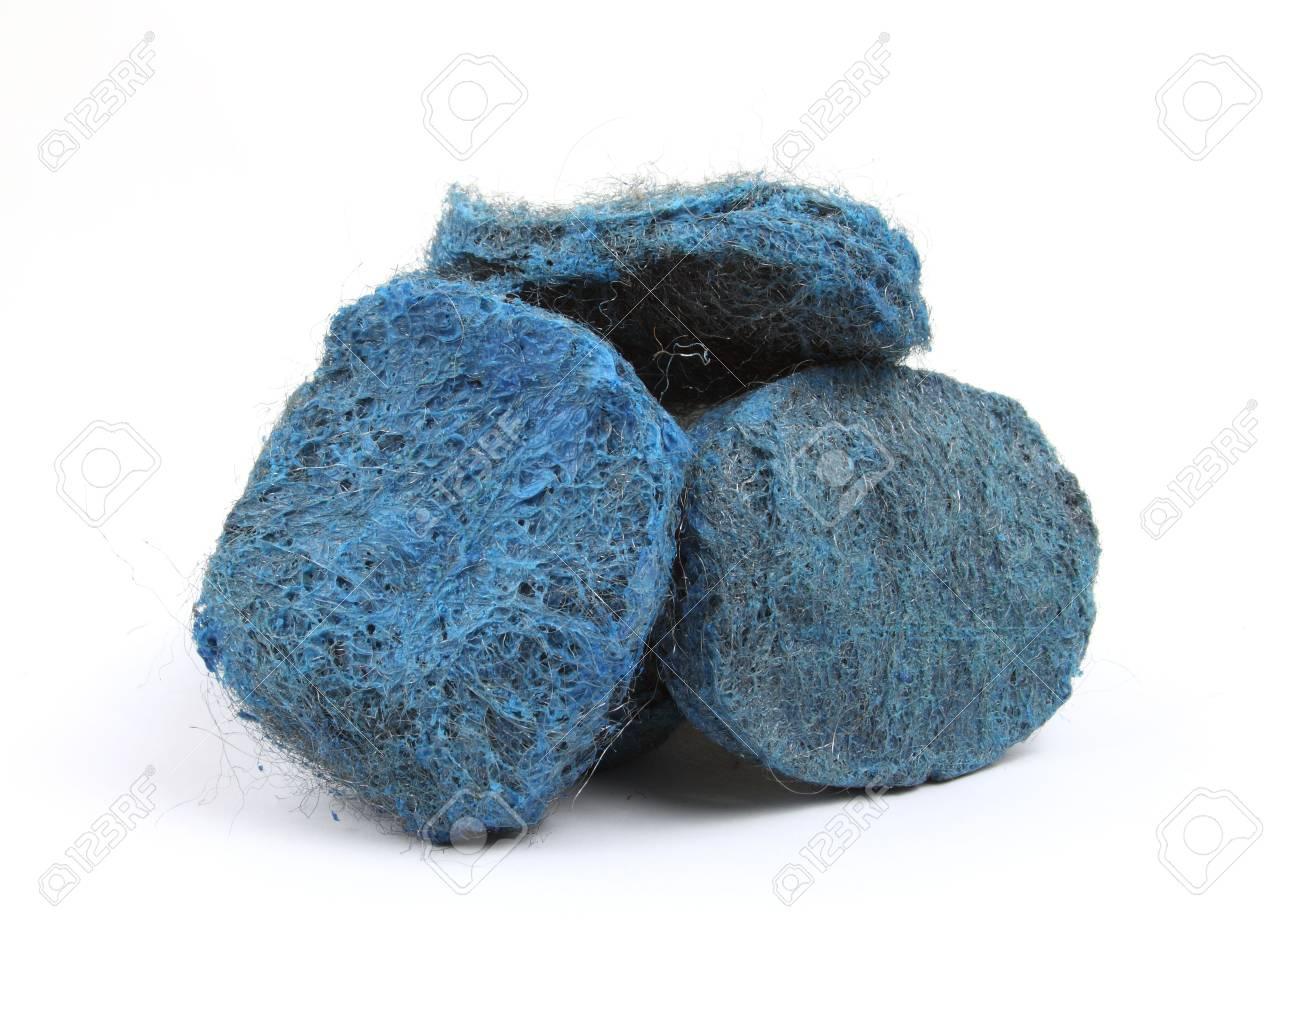 Steel wool soap pads Stock Photo - 6122282